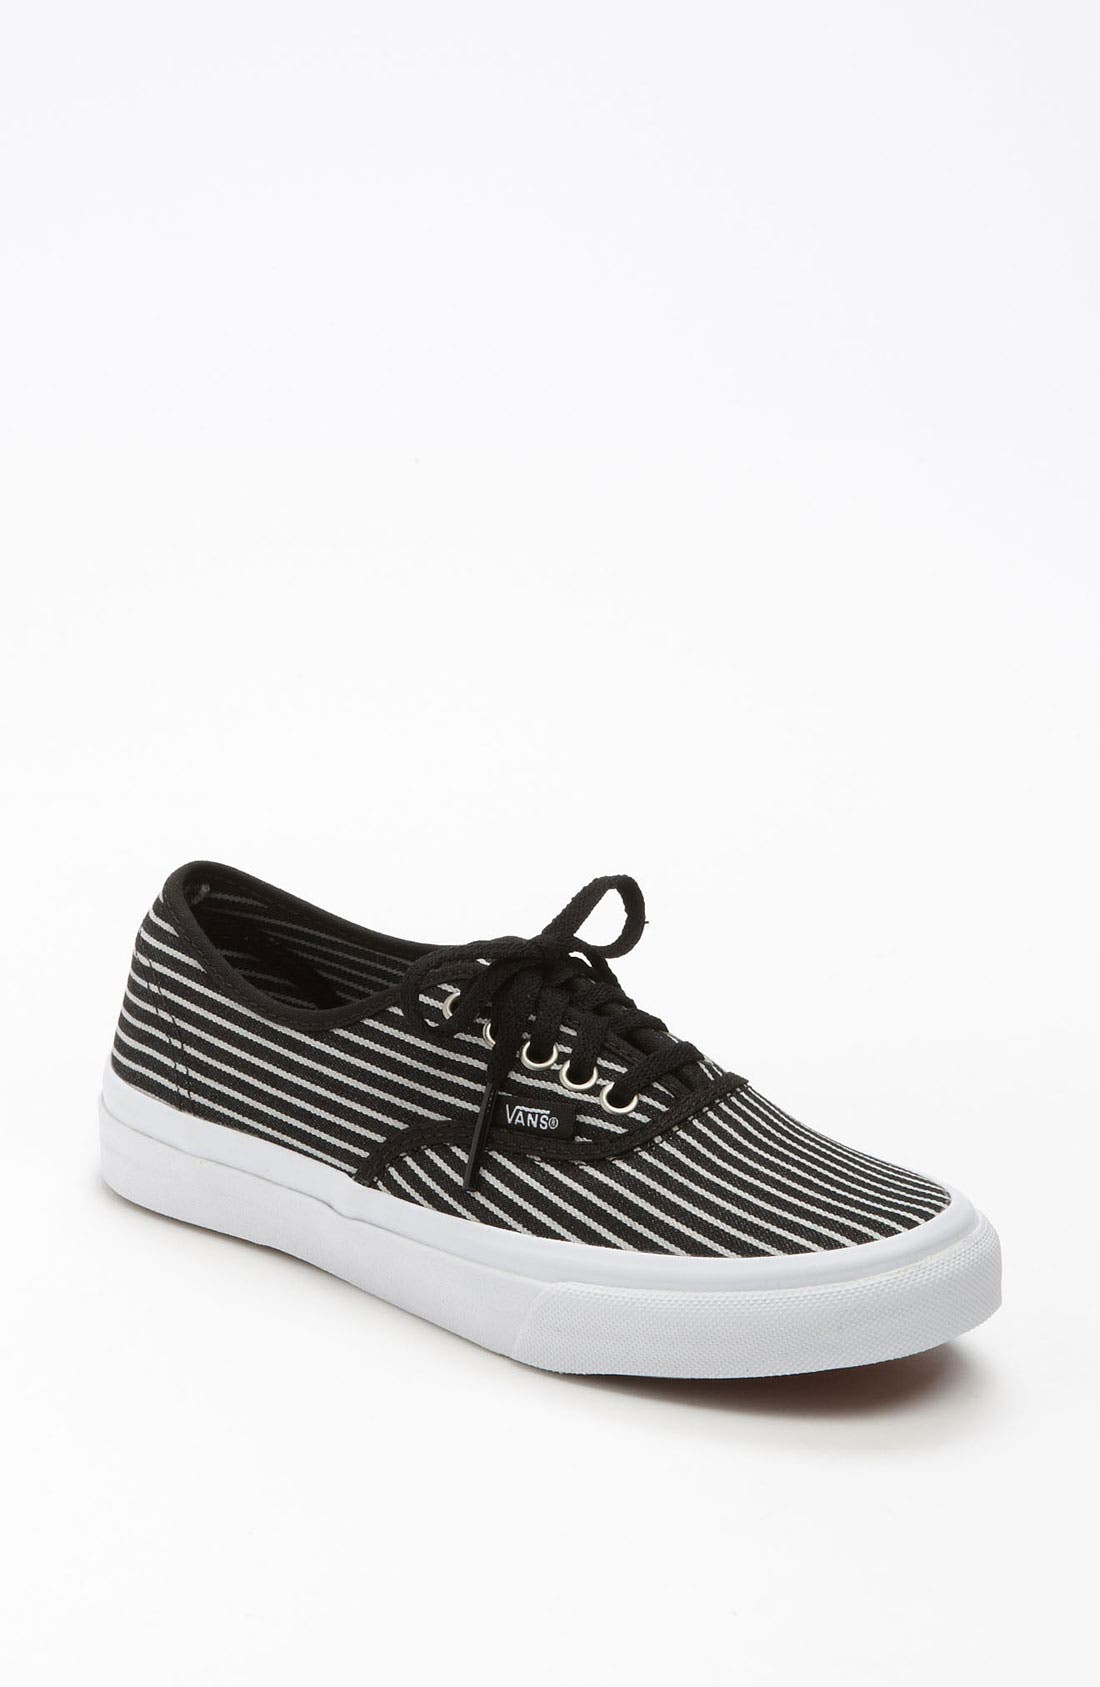 Alternate Image 1 Selected - Vans 'Authentic - Slim' Sneaker (Women)